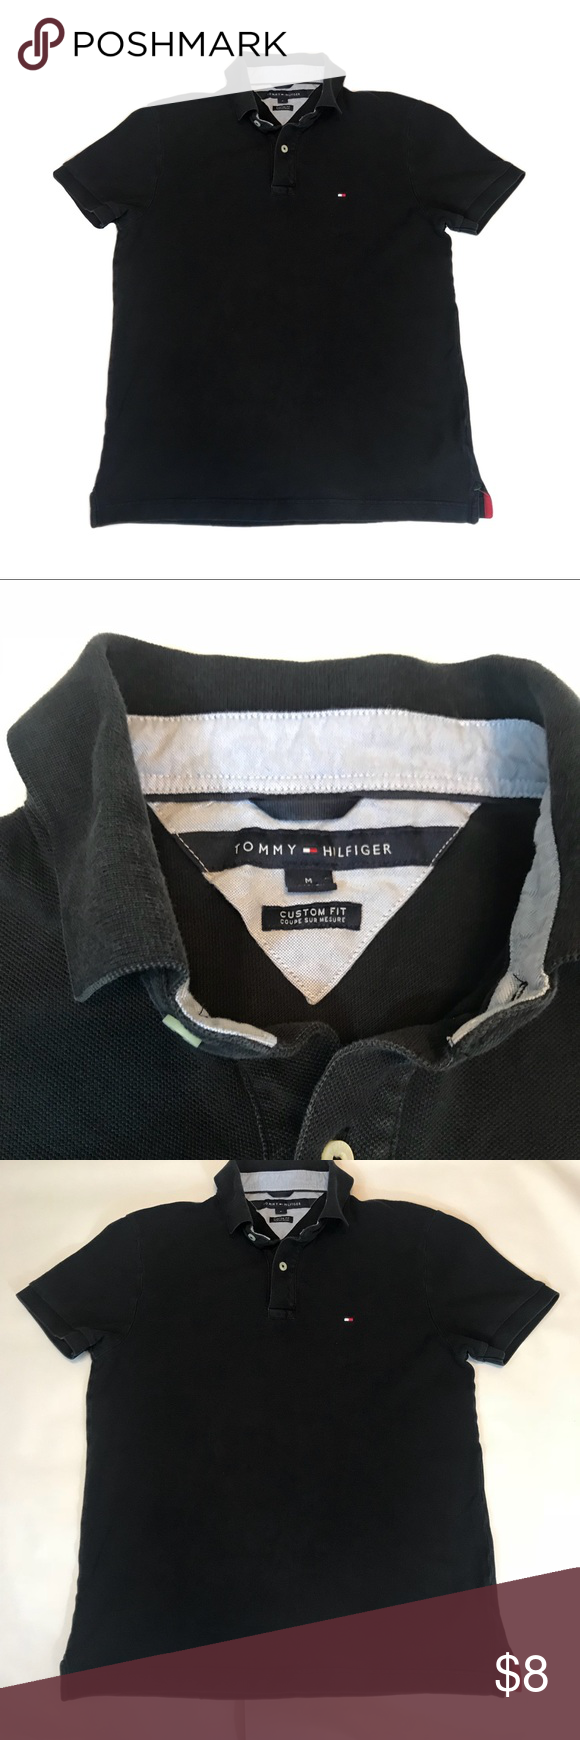 Tommy Hilfiger Blue Polo My Posh Picks Tommy Hilfiger Shirts